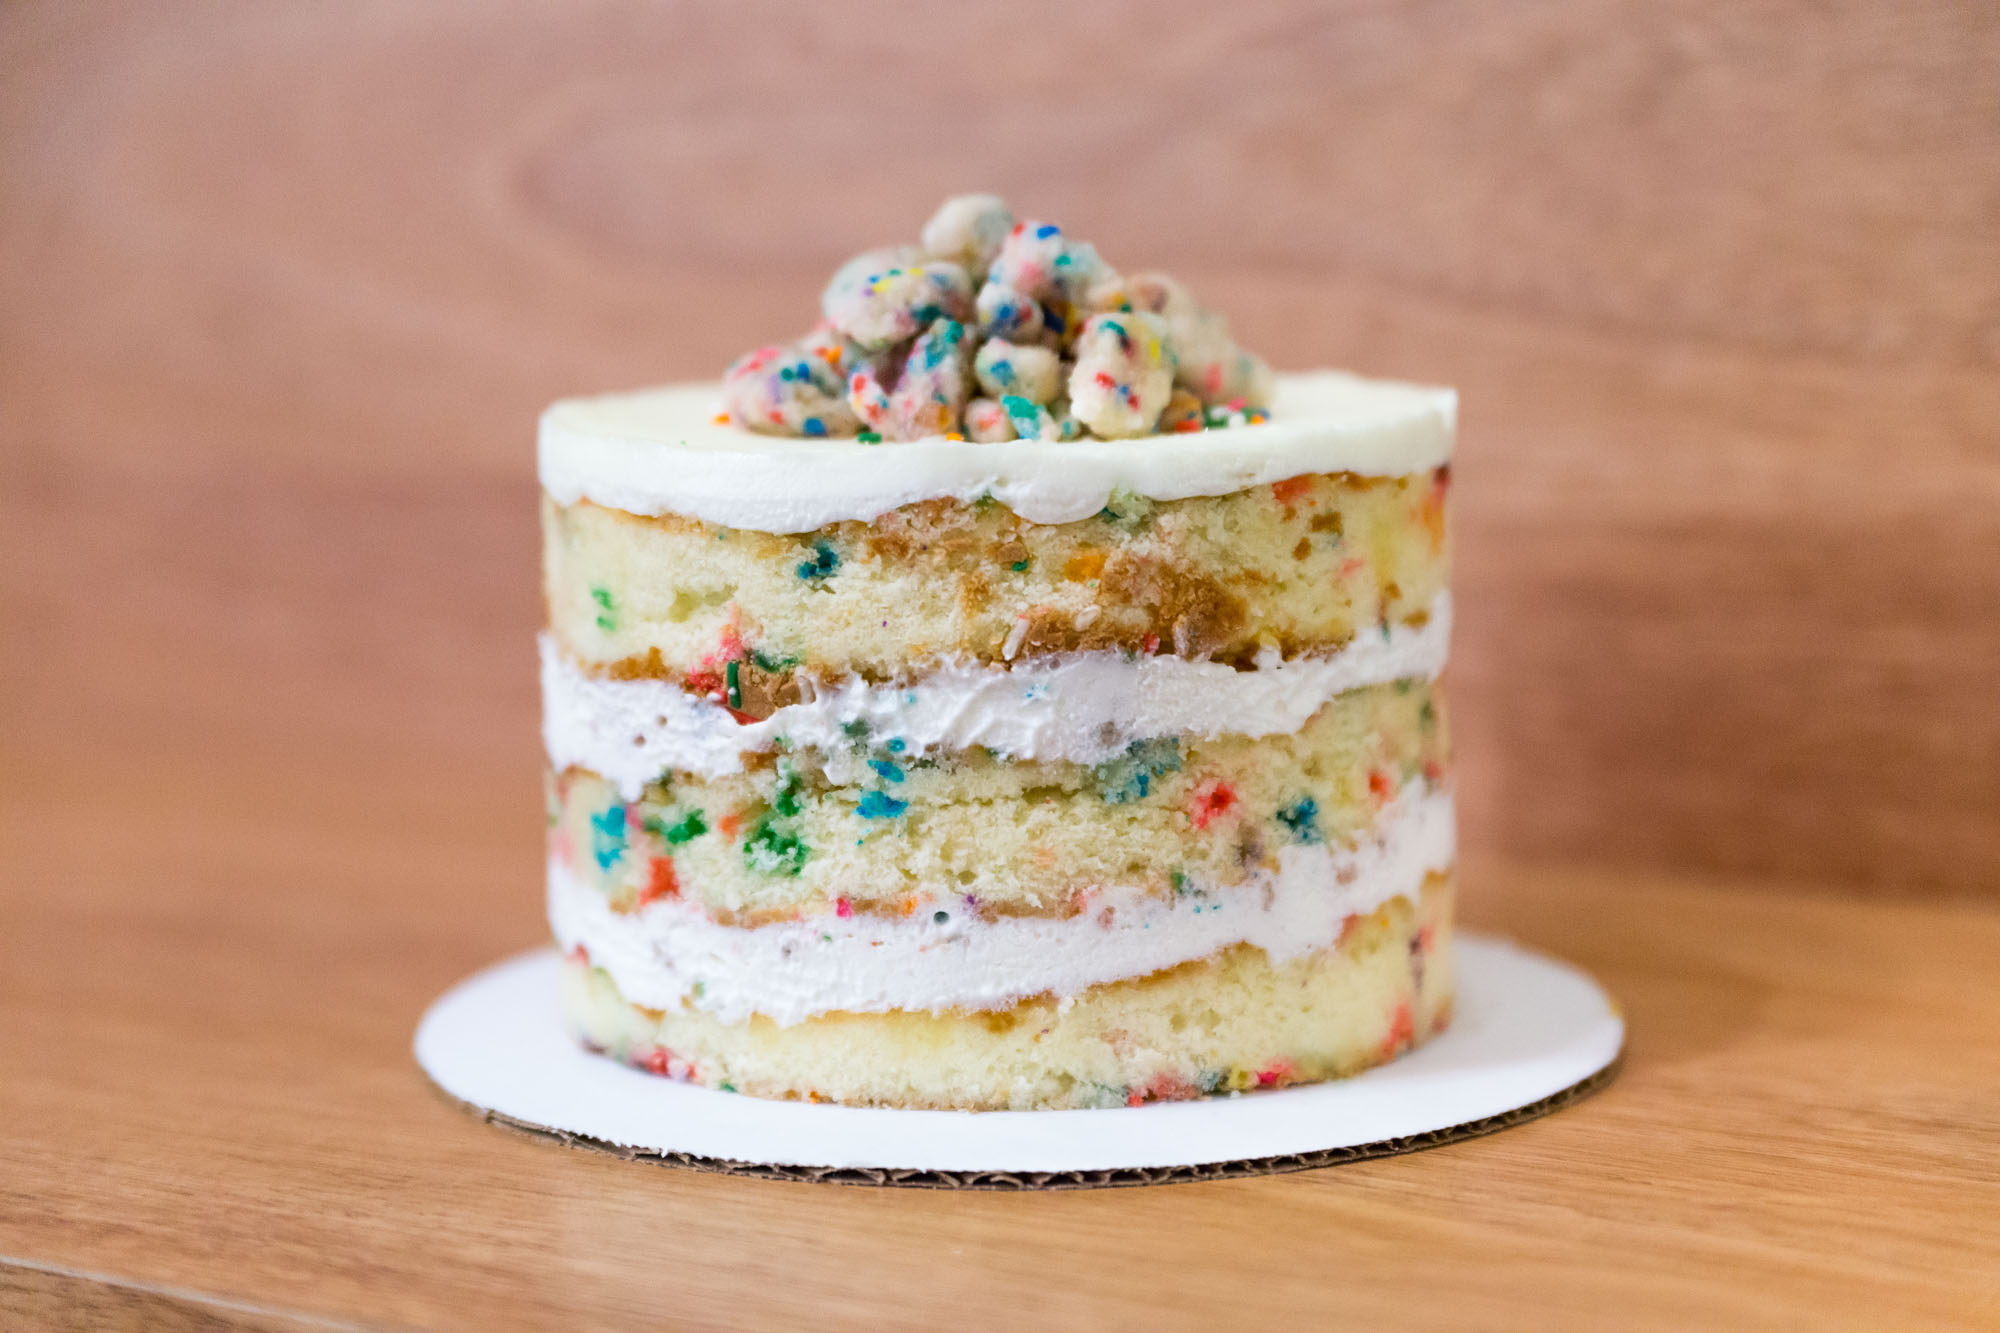 Birthday cake at Milk Bar